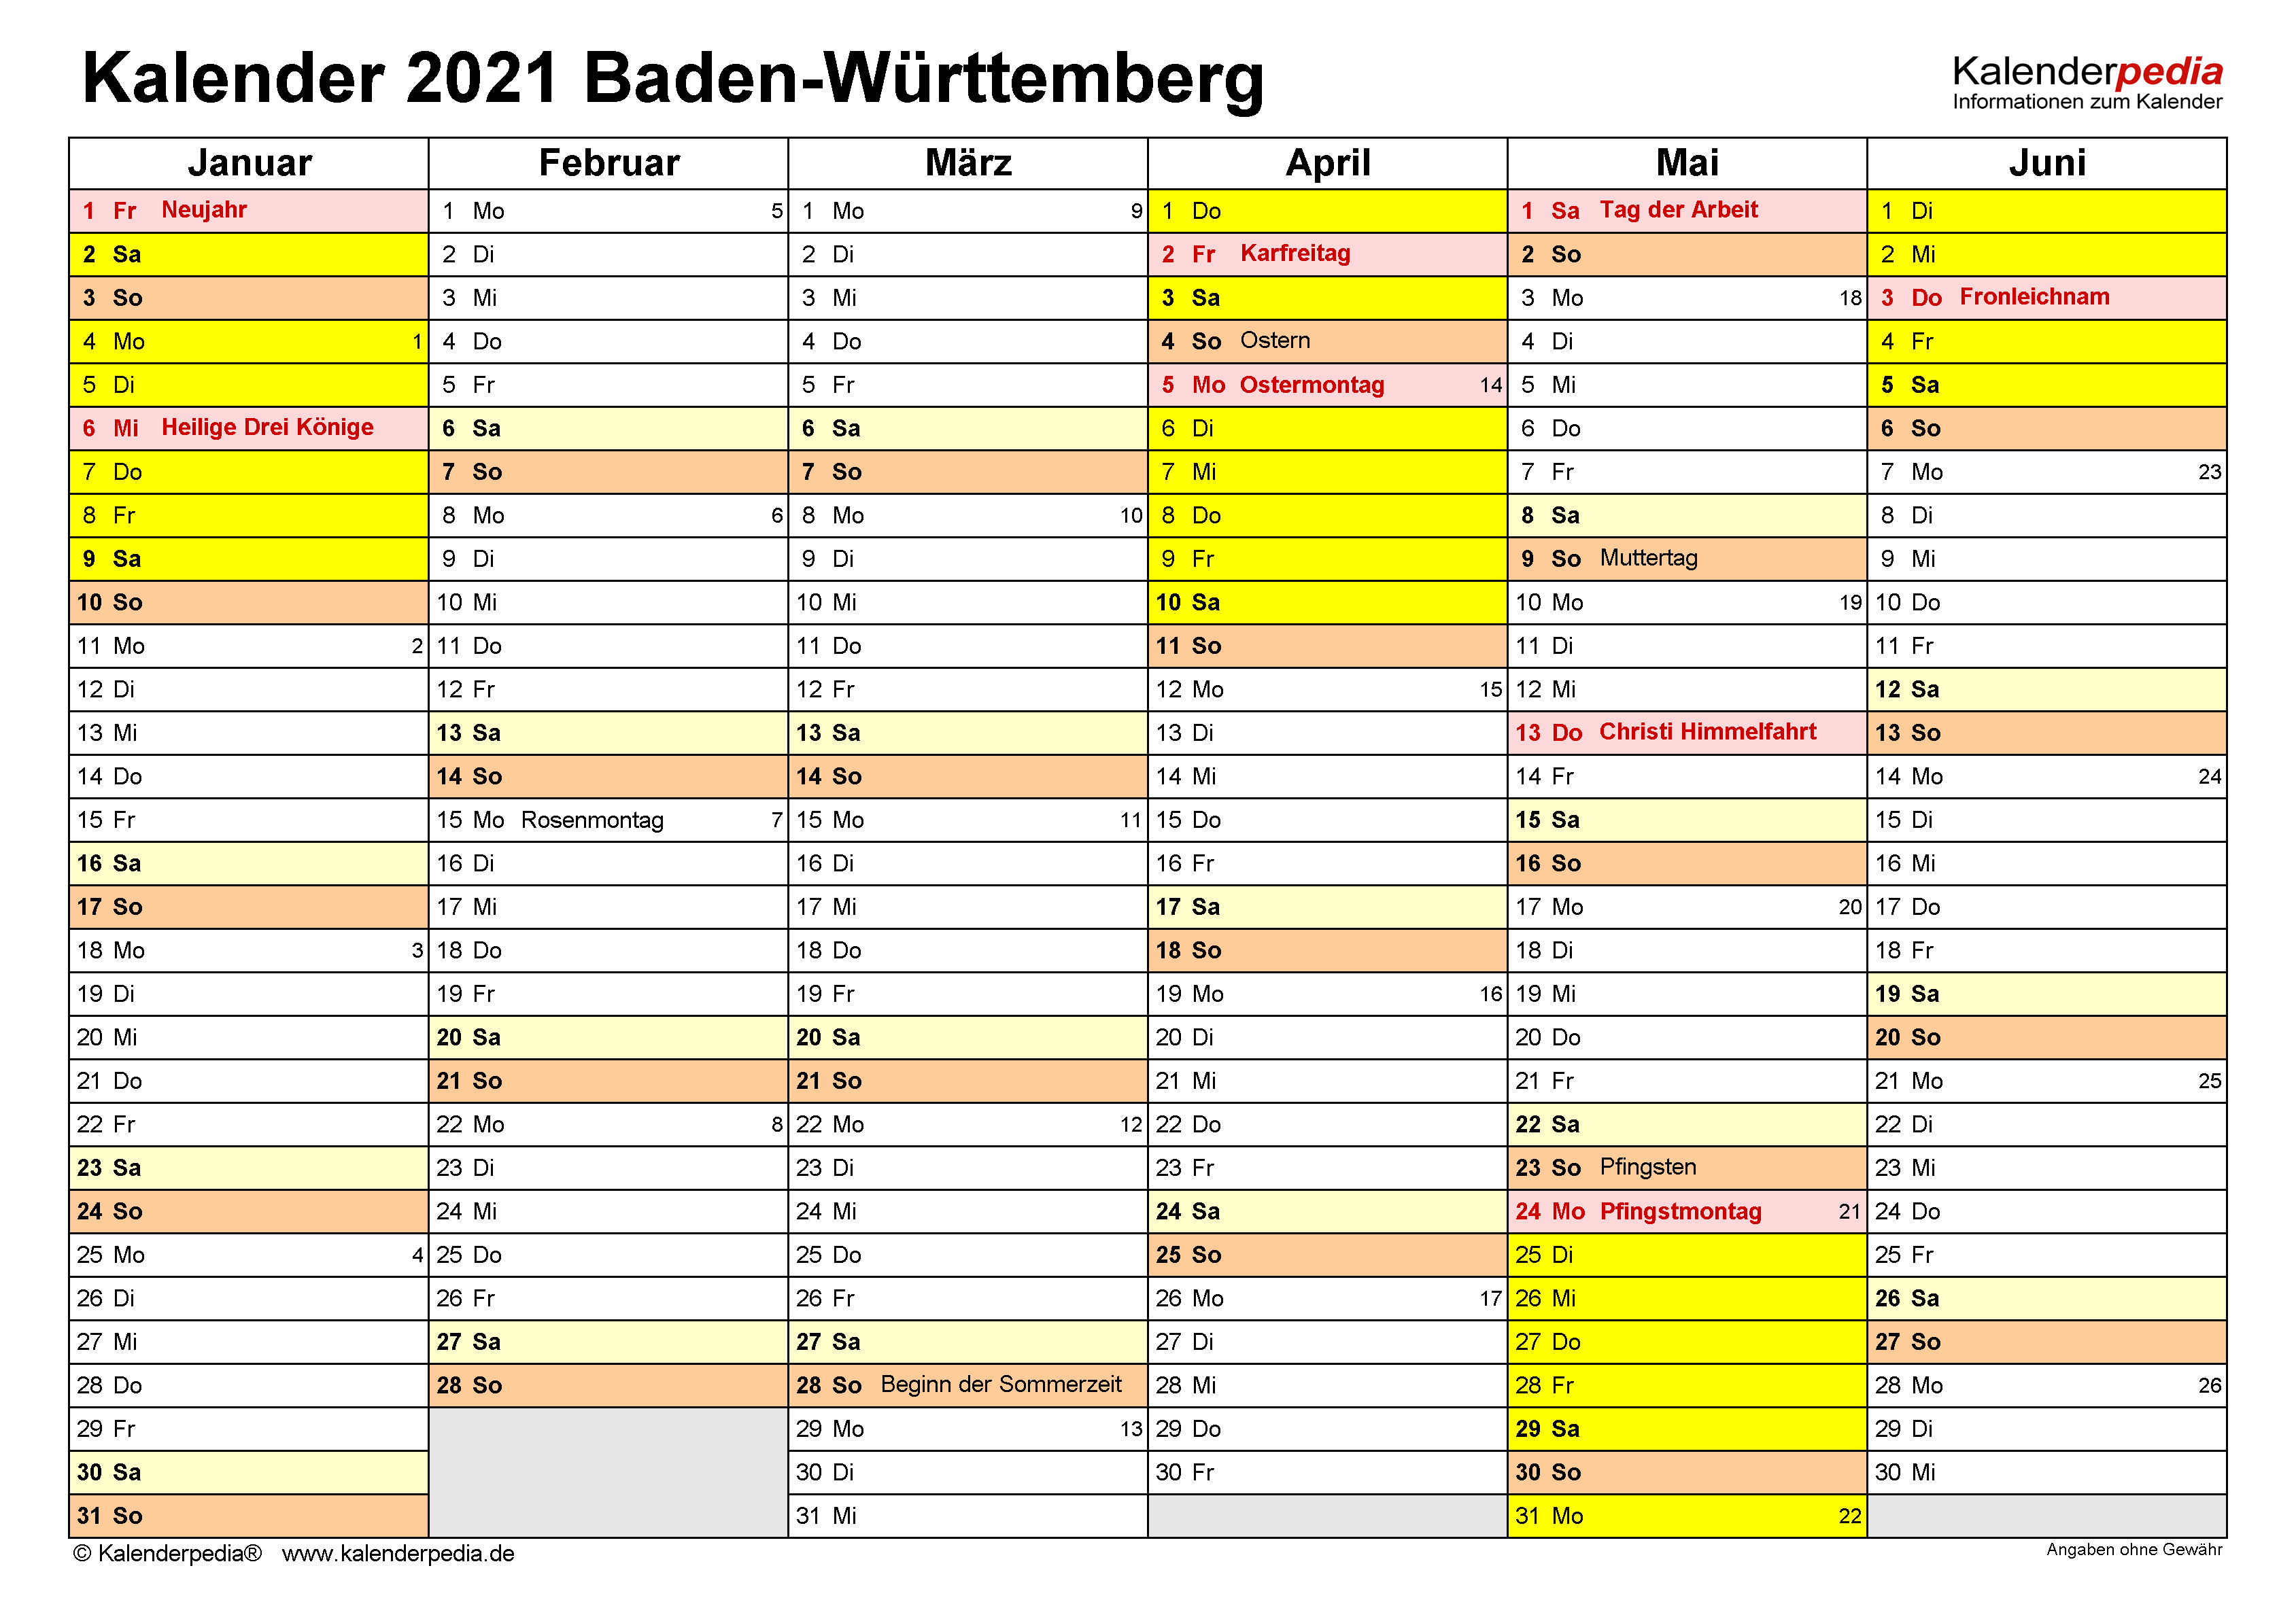 Kalender 2021 Baden-Württemberg: Ferien, Feiertage, Excel ...